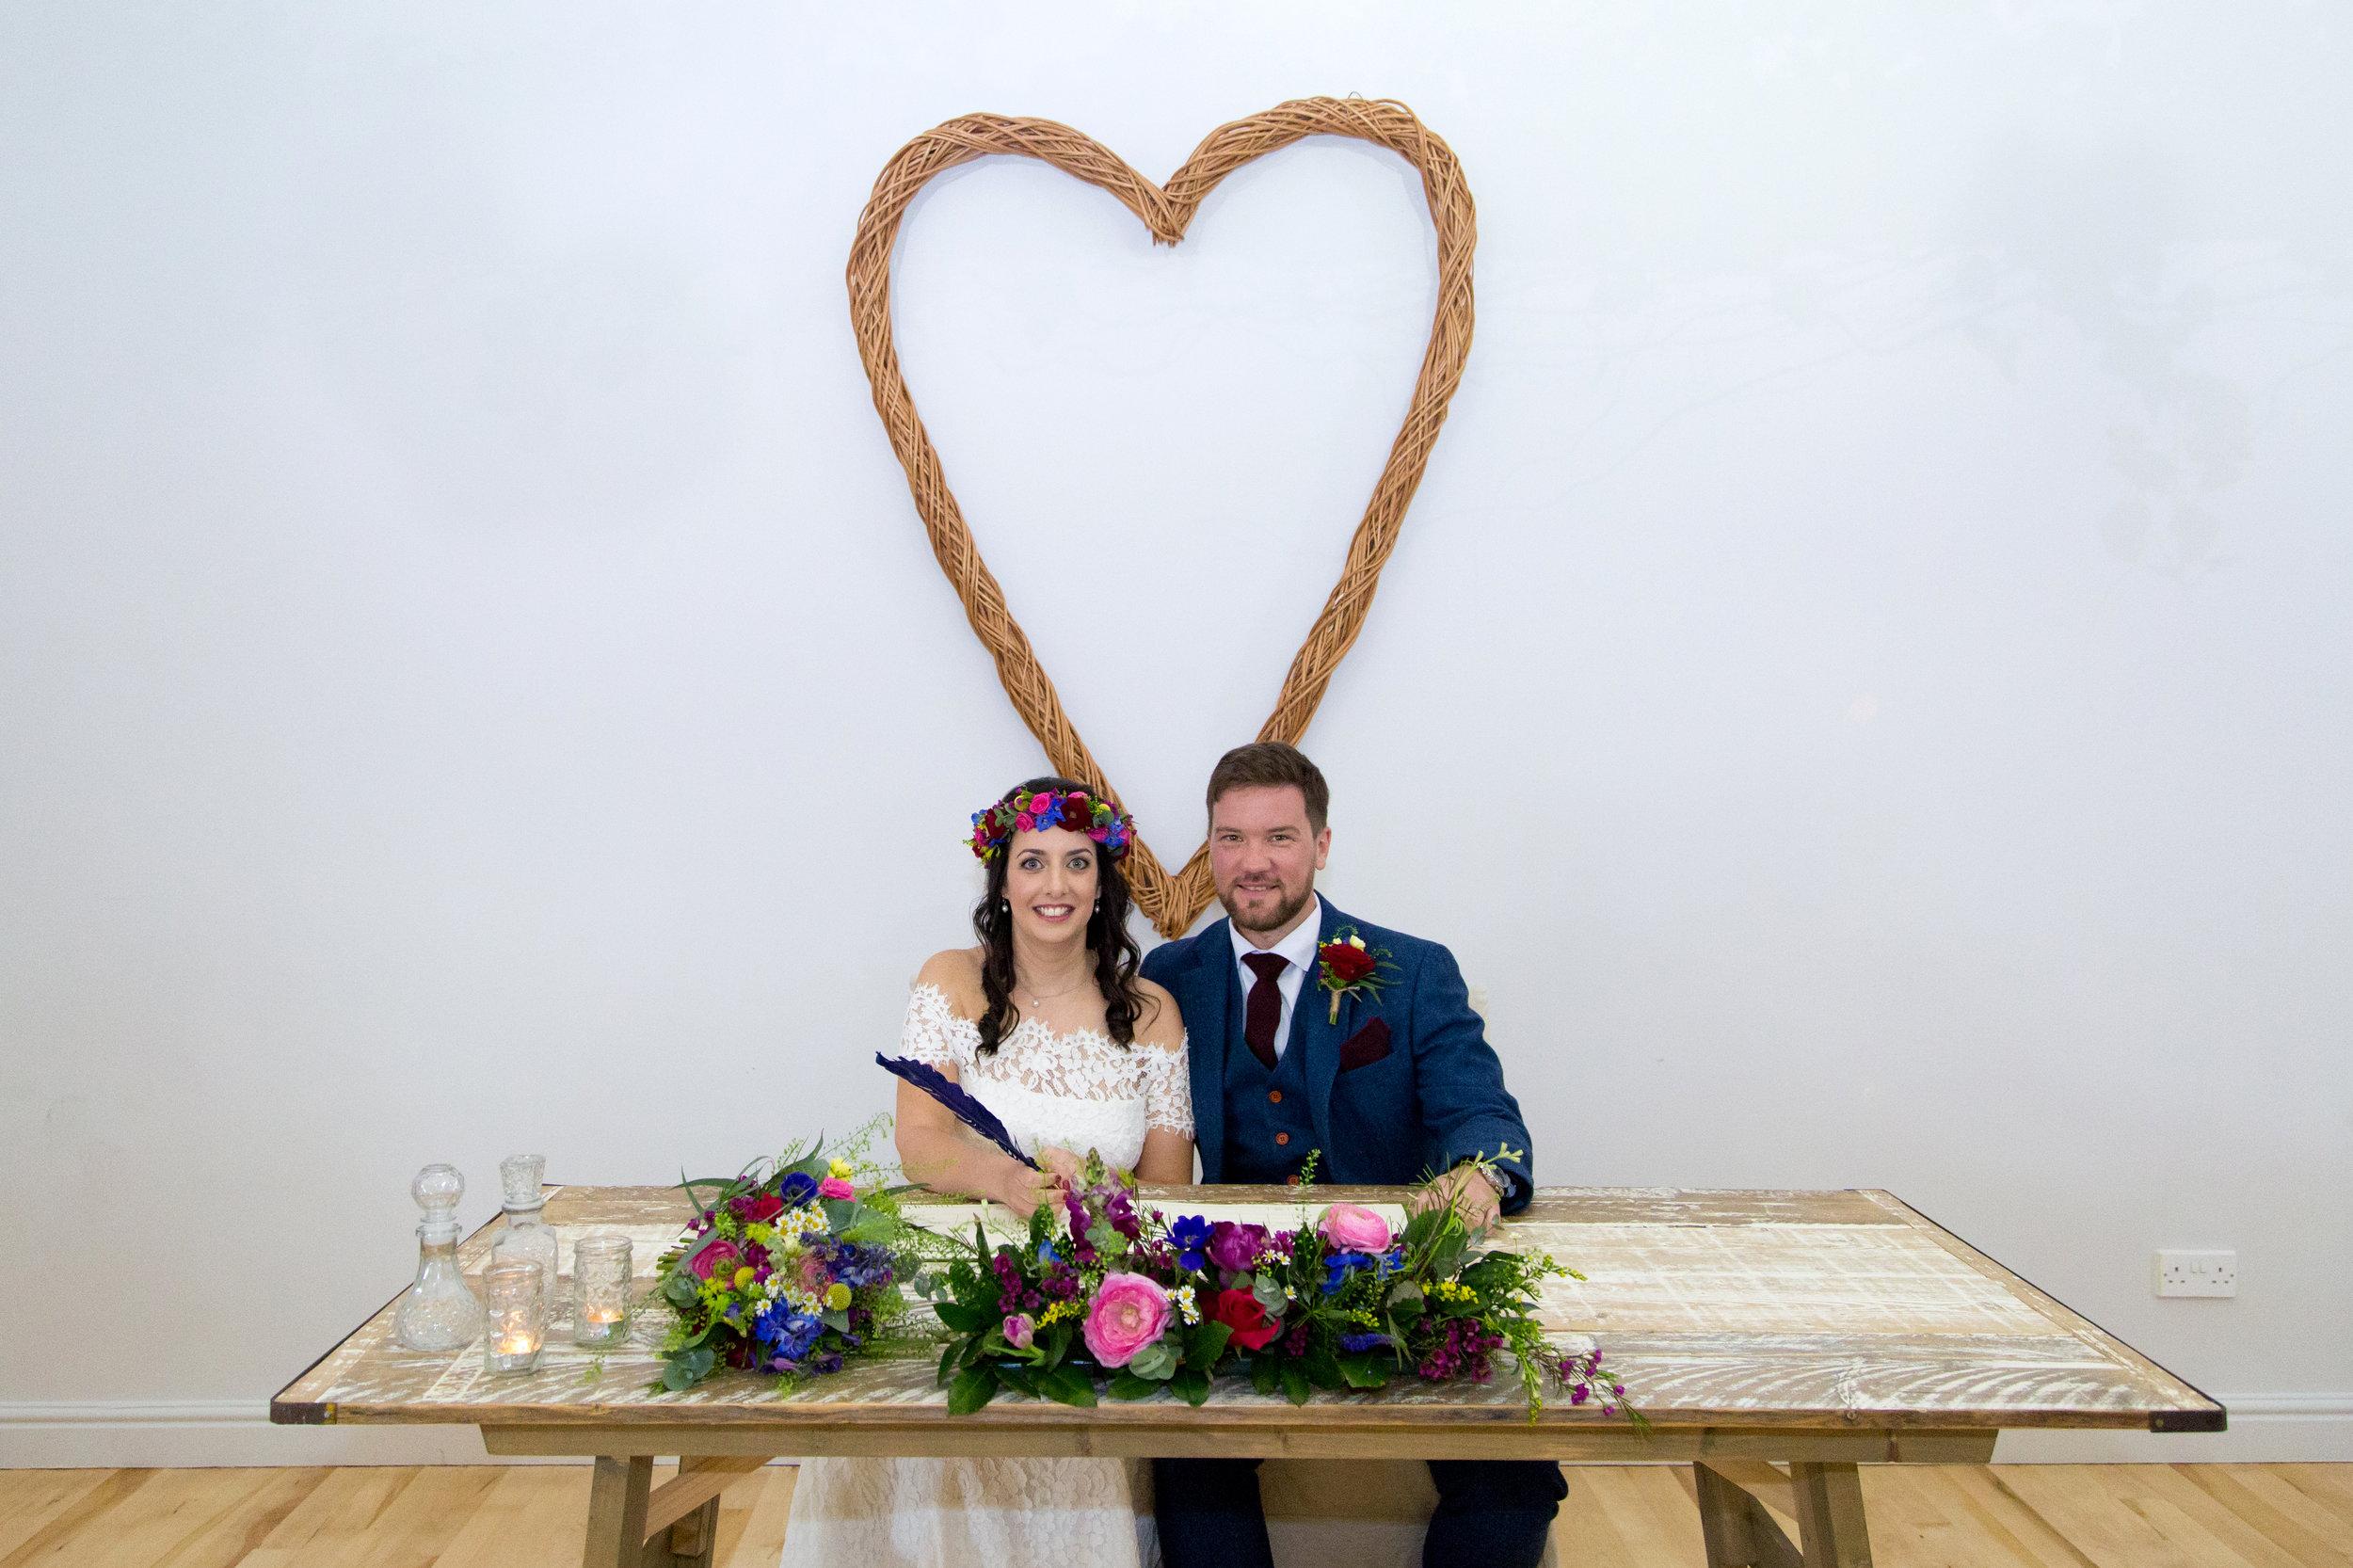 Vicky+Burlingham+Ceremony+Table.jpg